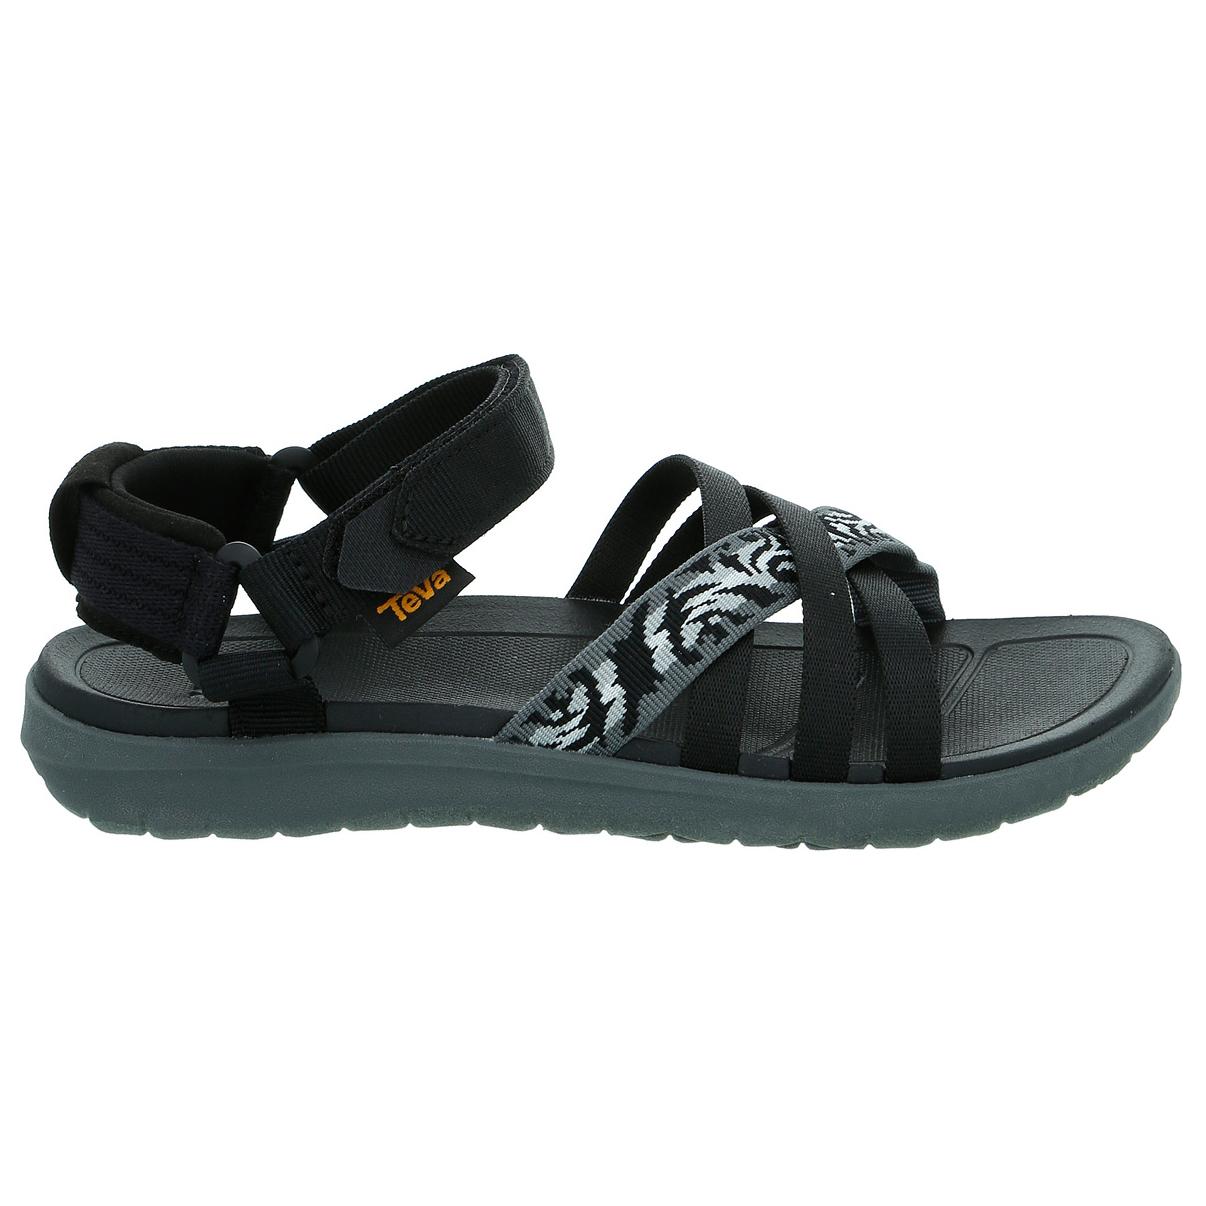 852ab75c6 Teva Sanborn Sandal - Sandals Women s